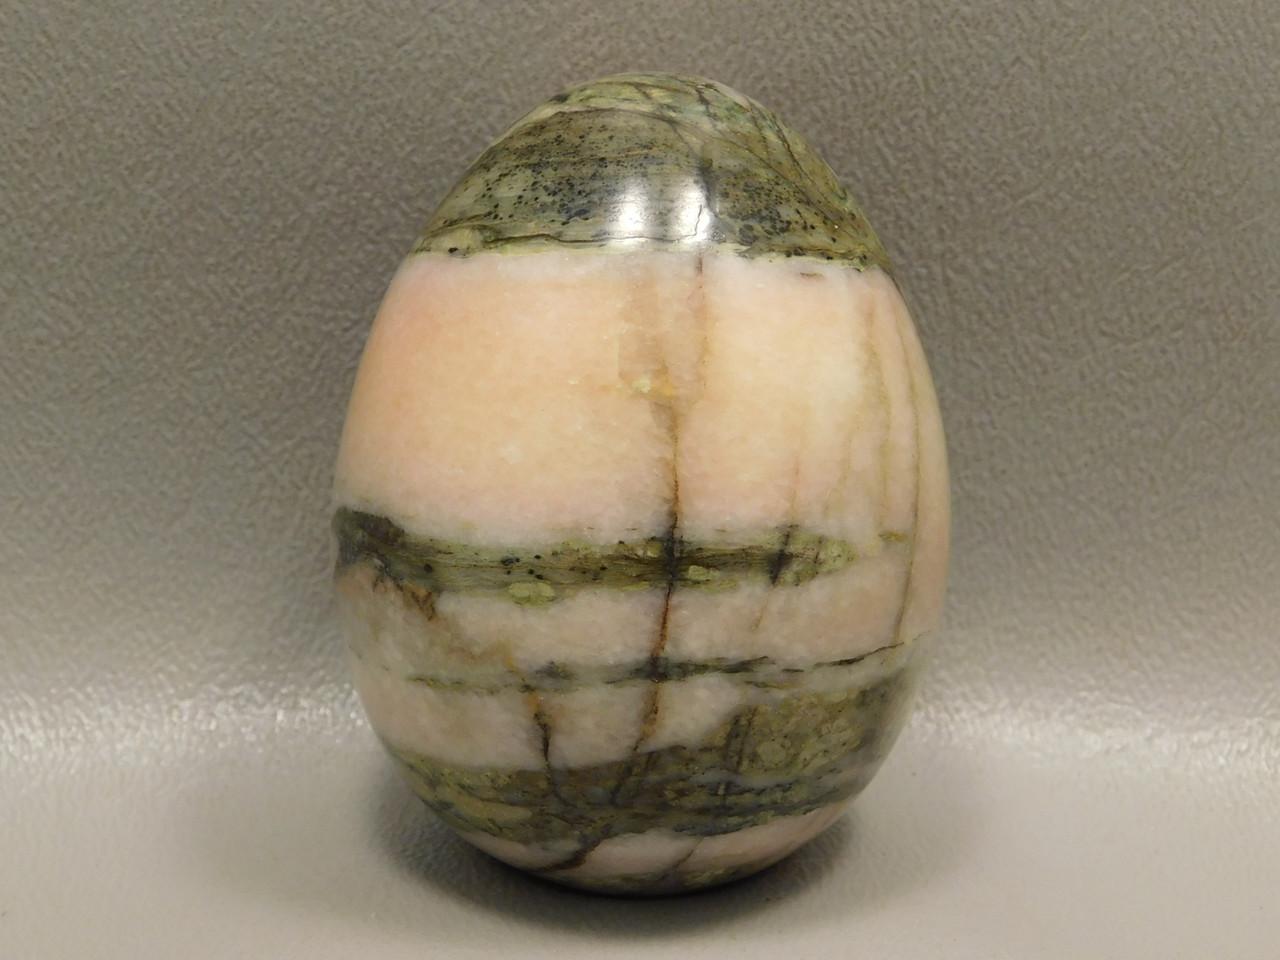 Harquahala Marble Stone Egg Shaped 2.35 inch Pink Rock Arizona #O1